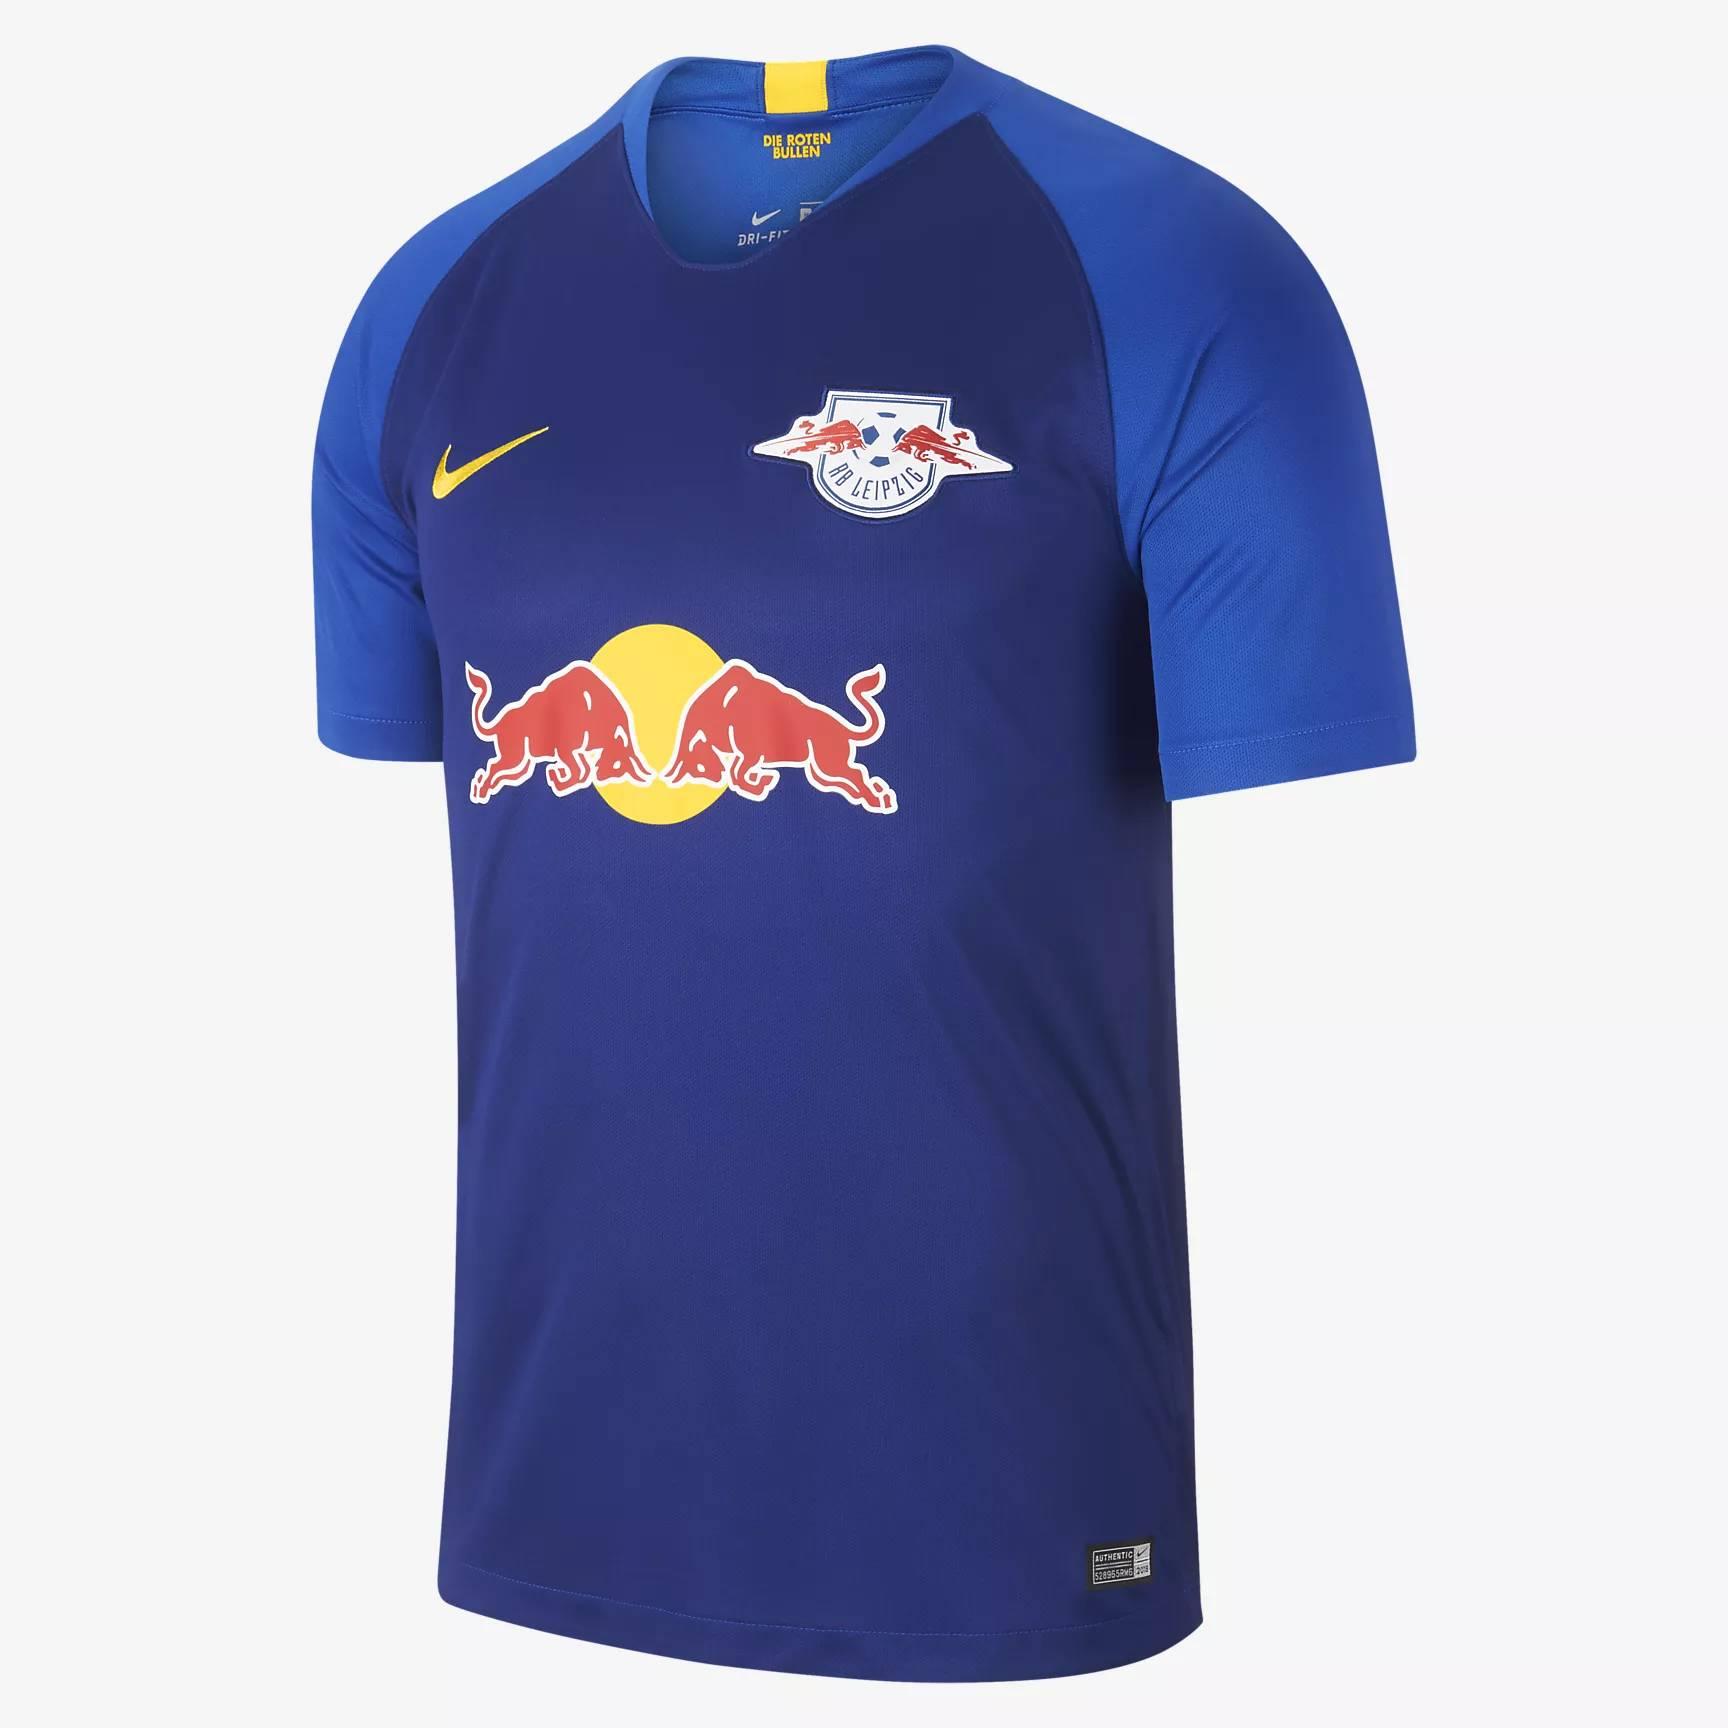 Rb Leipzig 18 19 Nike Away Kit 18 19 Kits Football